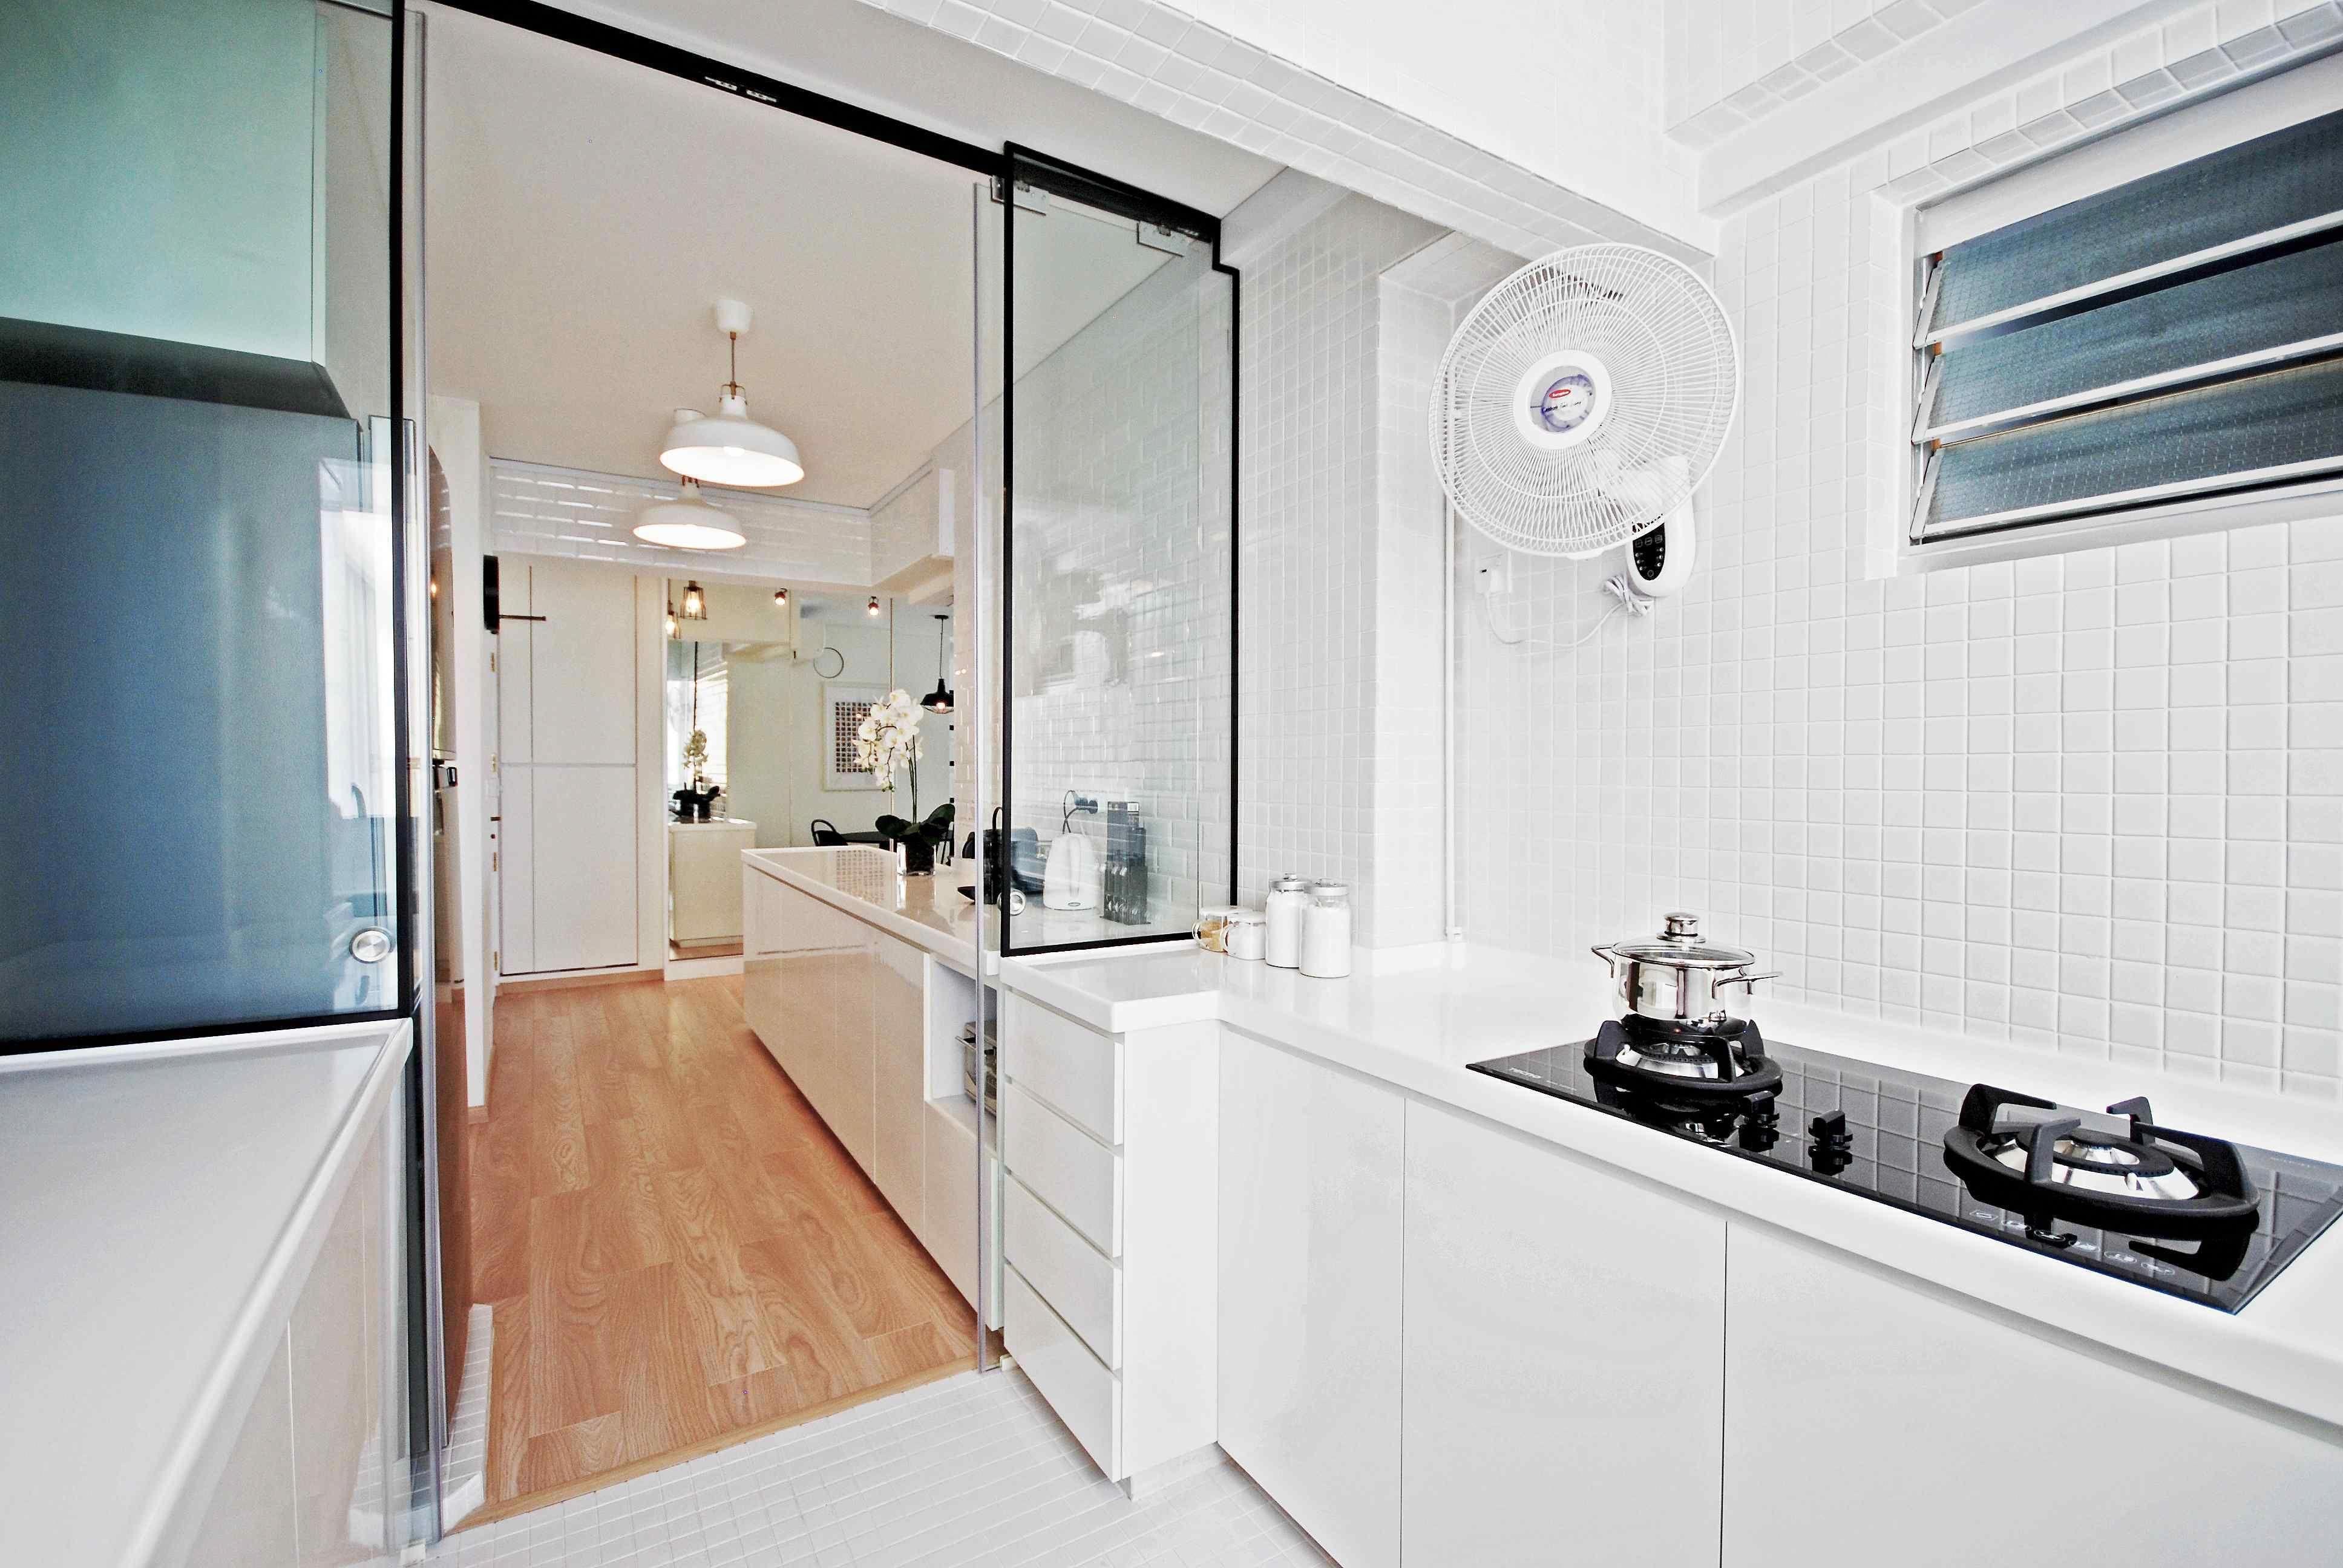 Wet Dry Kitchen Luxury Wet Dry Kitchen Dry Wet Kitchen For Residential Interior Design Renovati Kitchen Design Small Semi Open Kitchen Long Narrow Kitchen